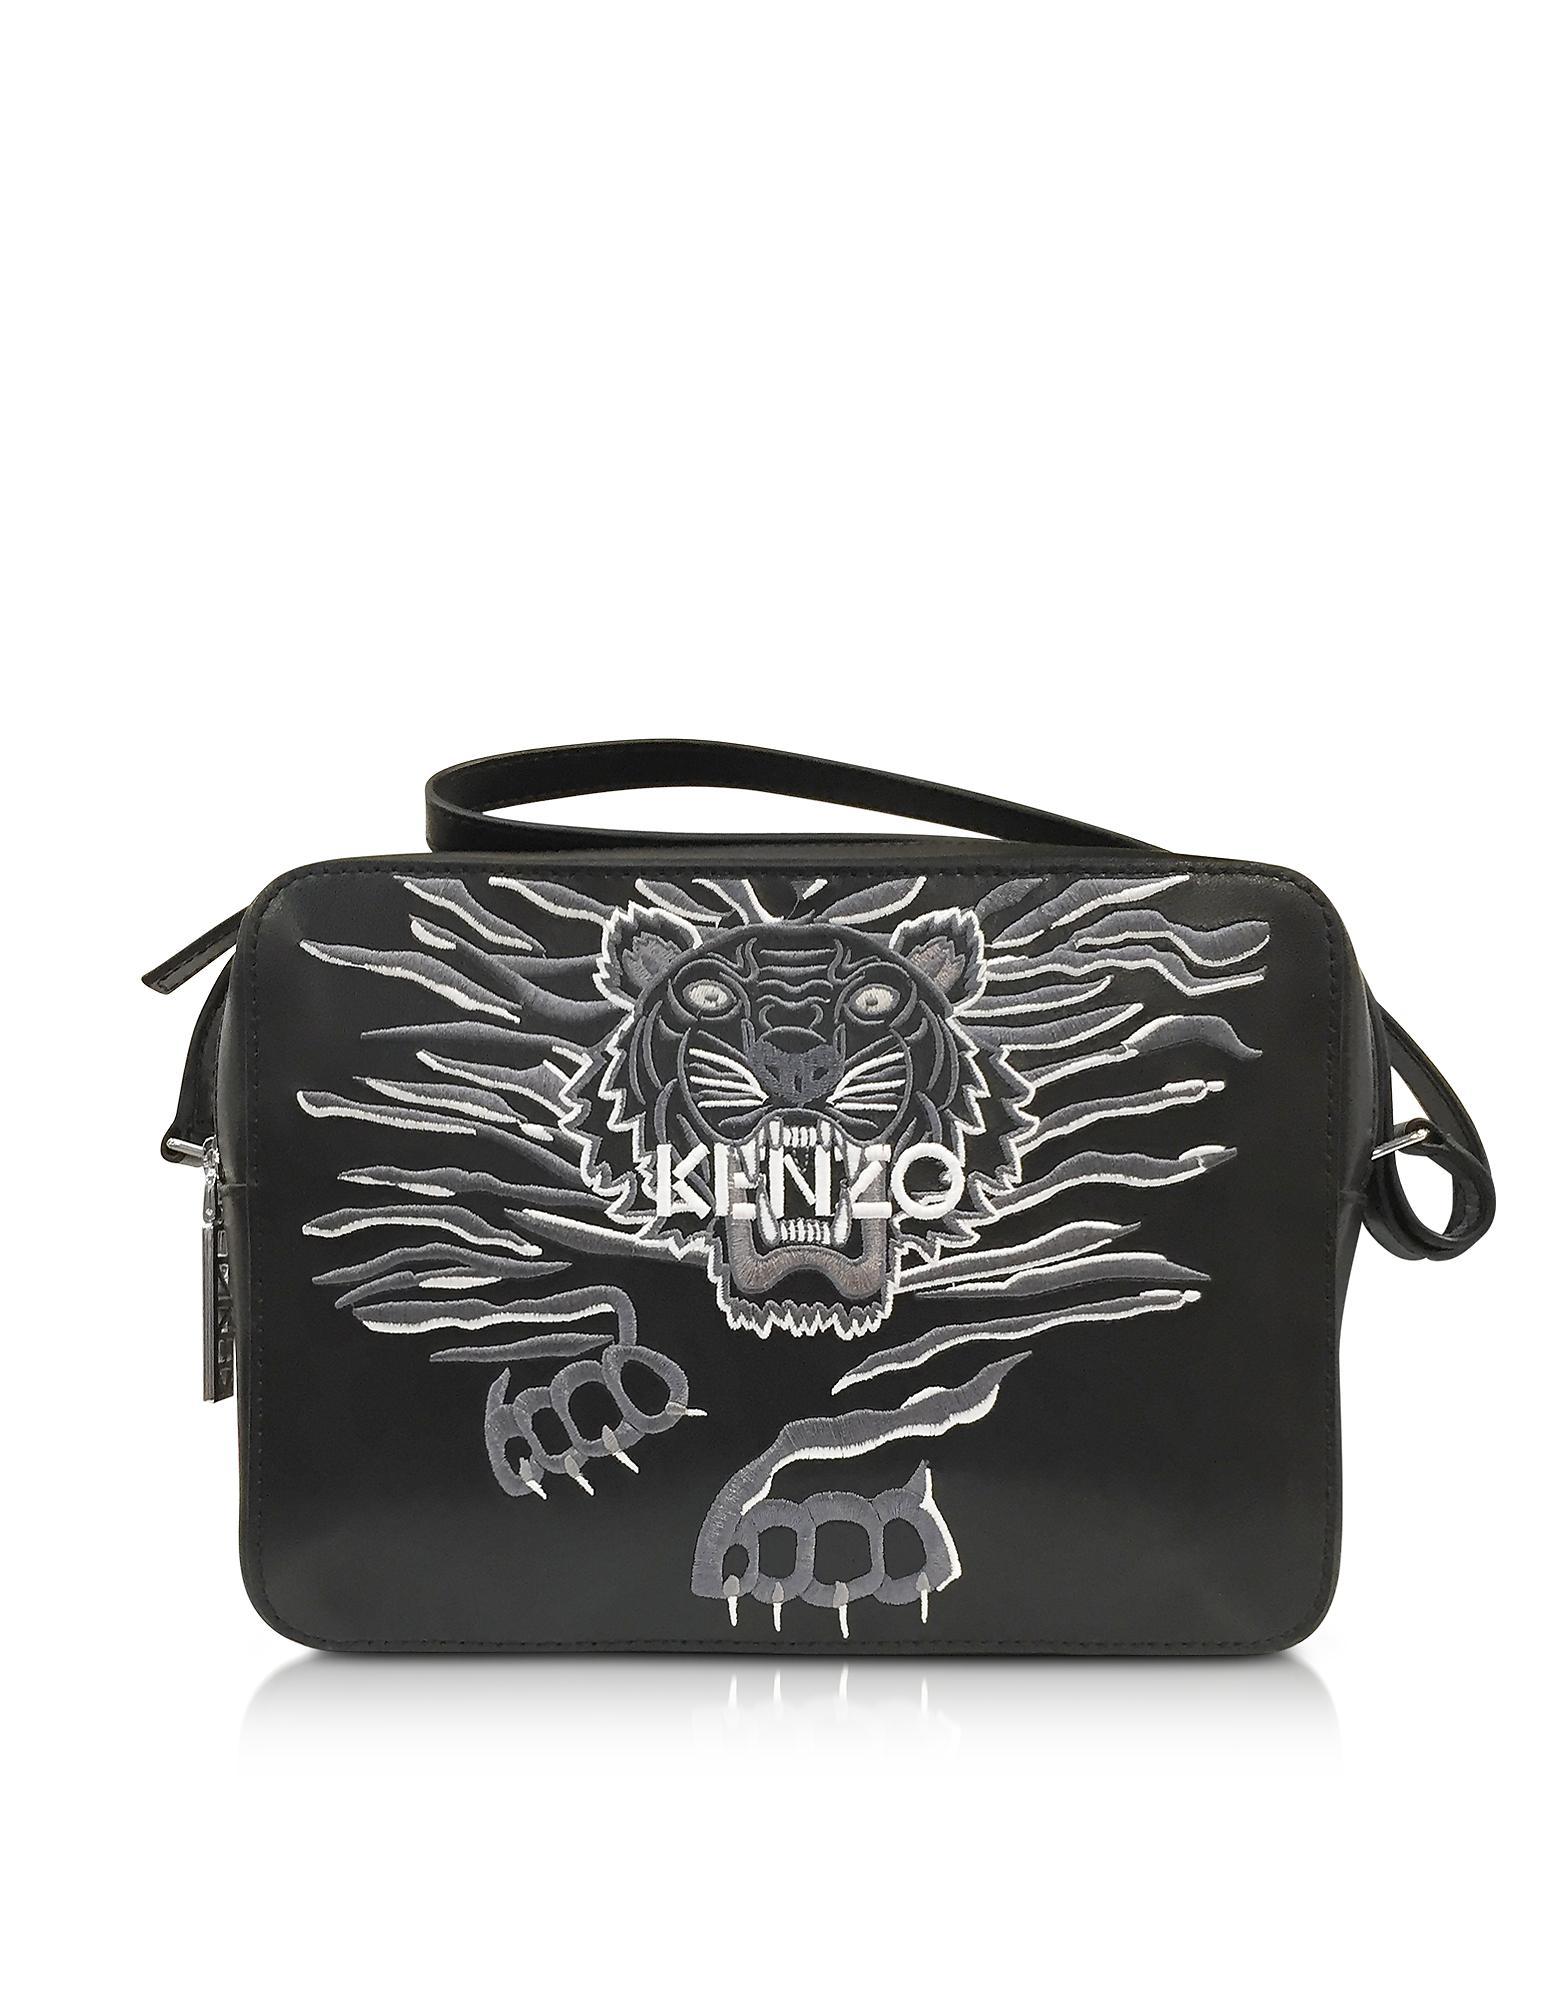 8b46f09f6d61 KENZO Black Leather Large Geo Tiger Crossbody Bag in Black - Lyst